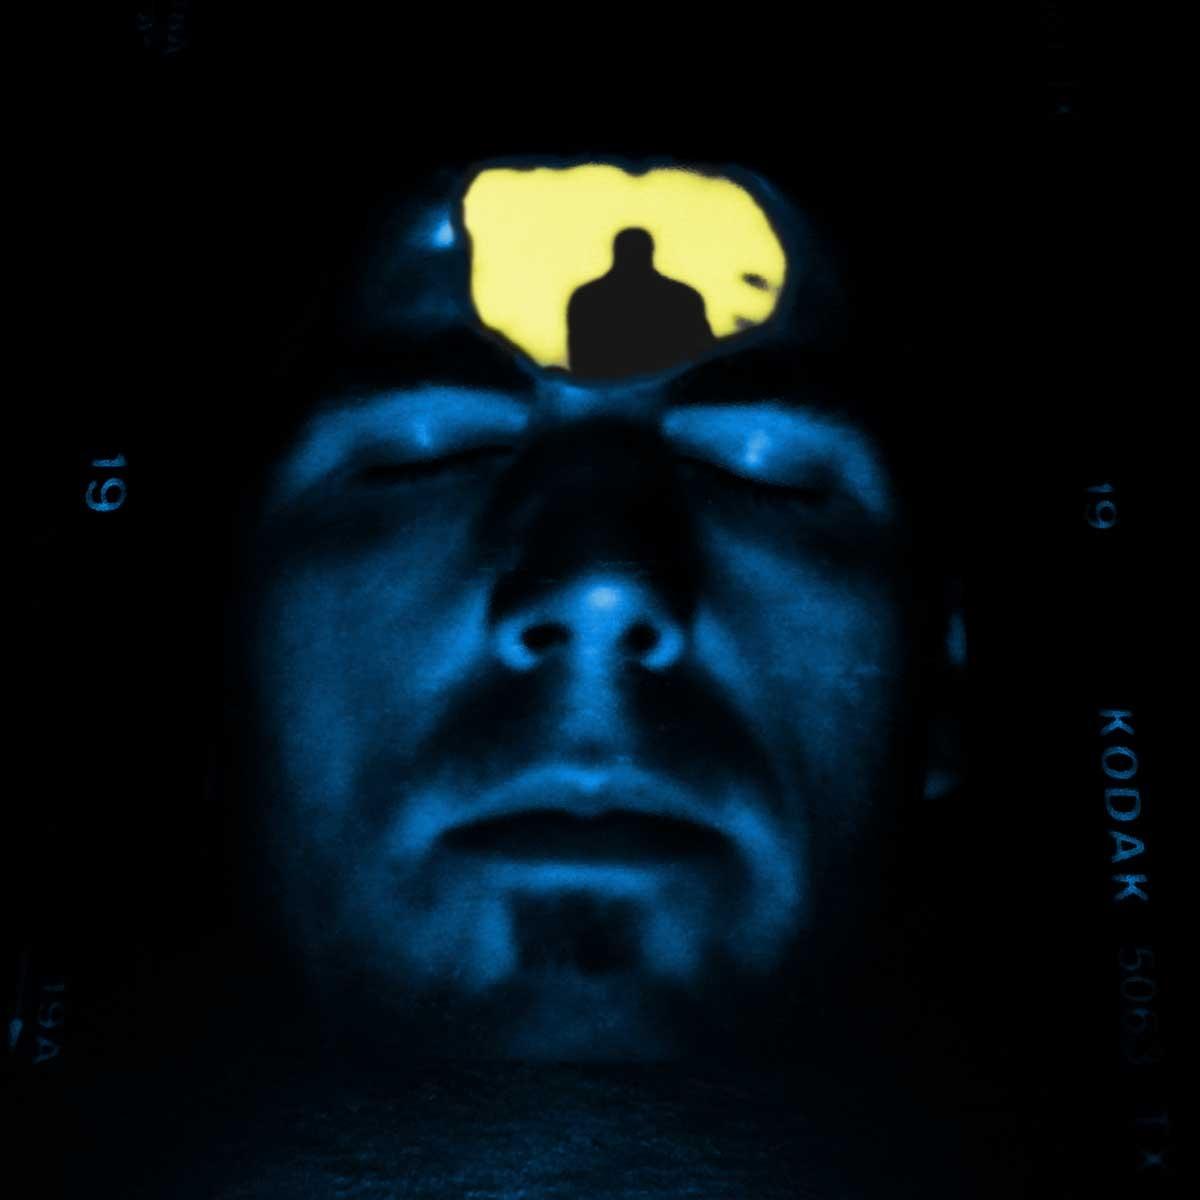 3rd Eye Vision - Scott Hall